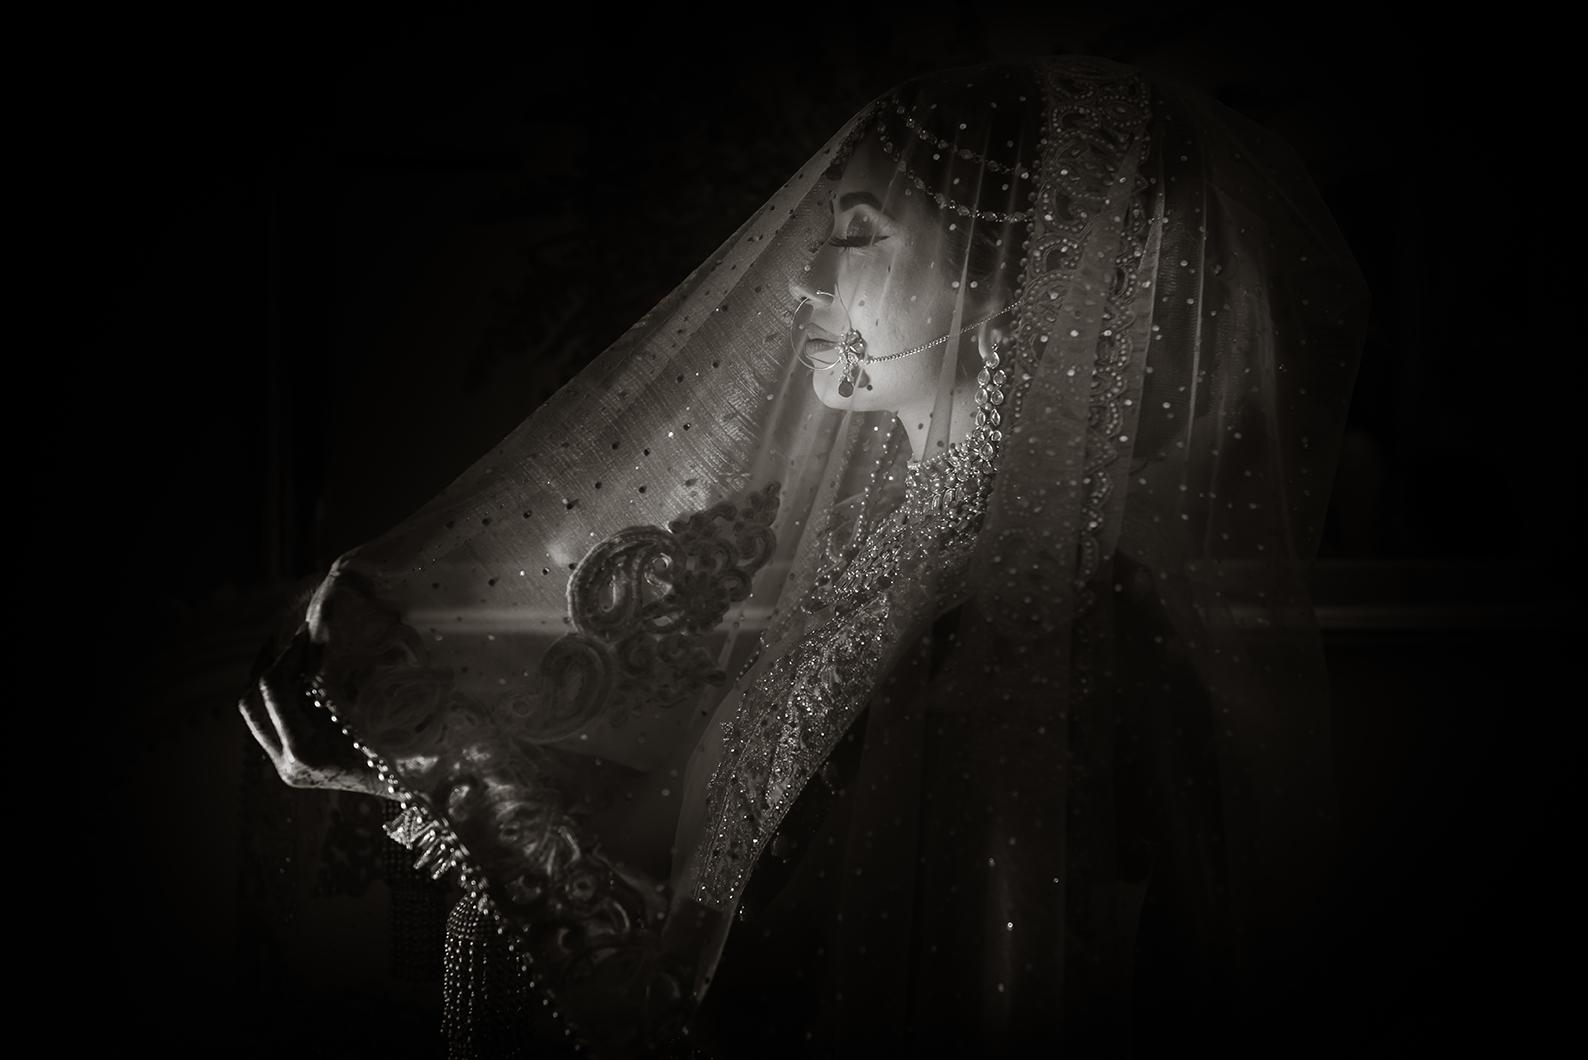 south_asian_wedding_photography_dhoom_studio_new_york15 SOUTH ASIAN WEDDINGS